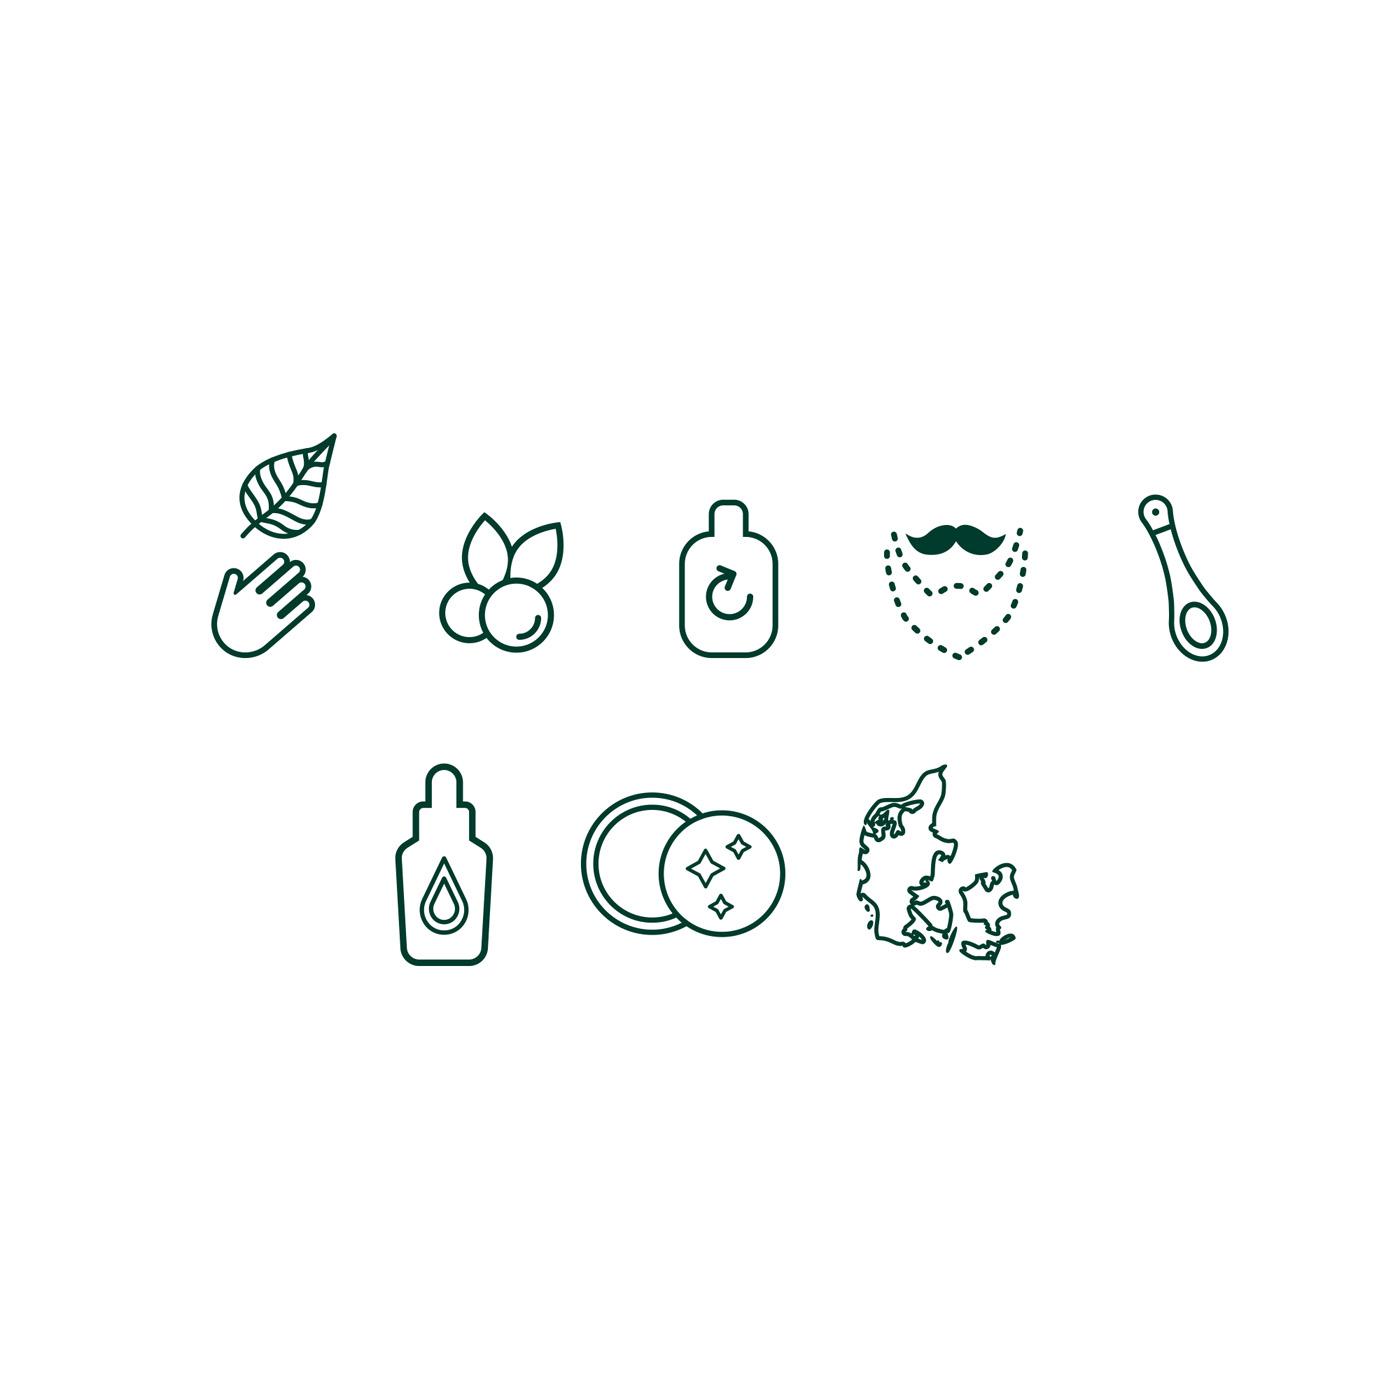 jun grooming organic cosmetics branding icons design